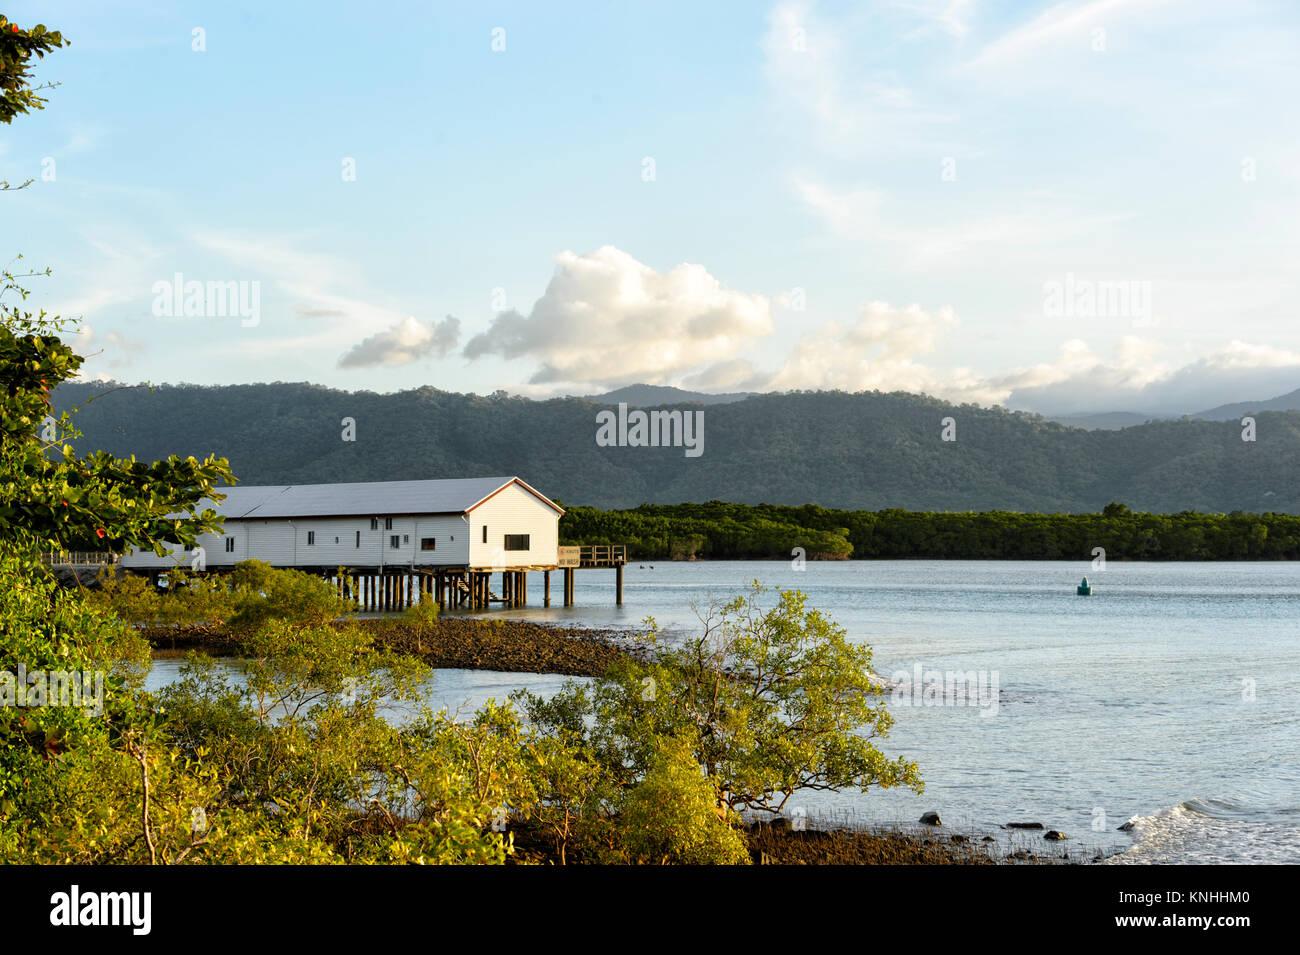 Quai de sucre historique, Dickson Inlet, Port Douglas, Far North Queensland, Queensland, Australie, FNQ Photo Stock